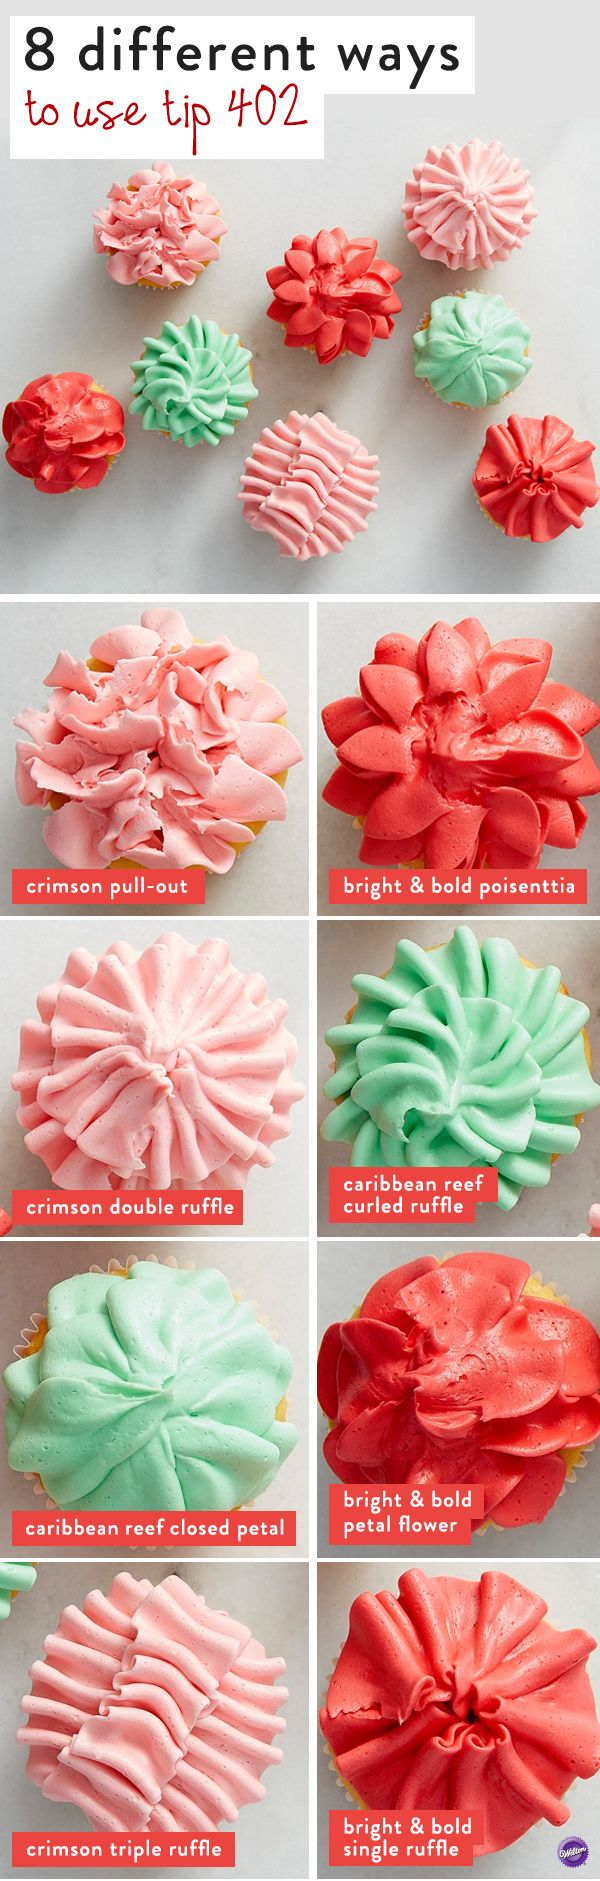 Cake Decorating Tips Tip 402 Used 8 Different Ways Unique Cake